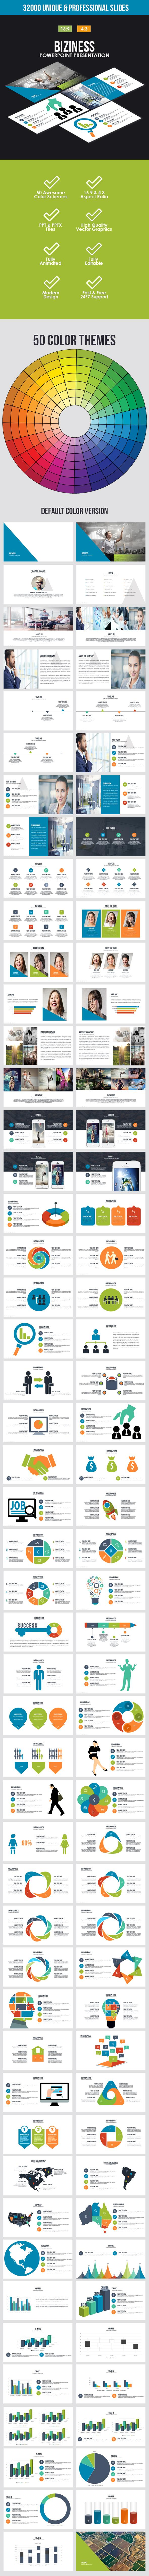 Biziness Powerpoint Presentation Template - Business PowerPoint Templates